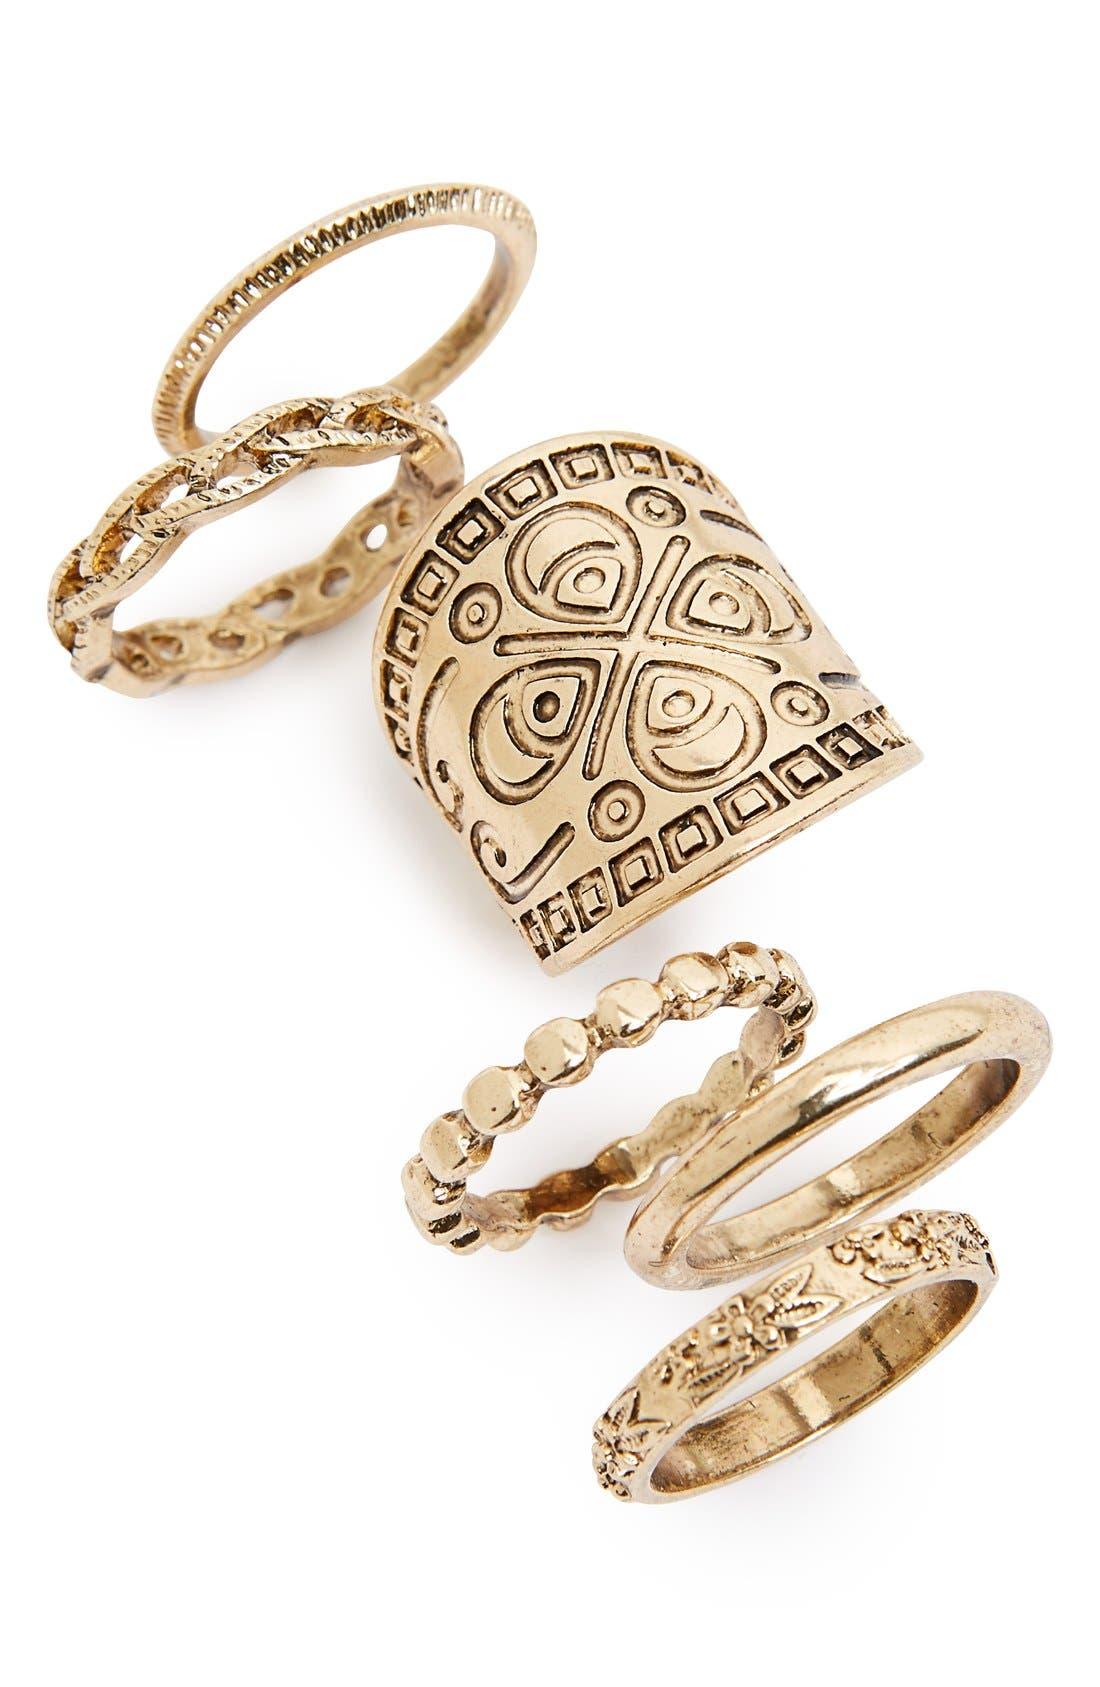 Main Image - Topshop Engraved Rings (Set of 6)